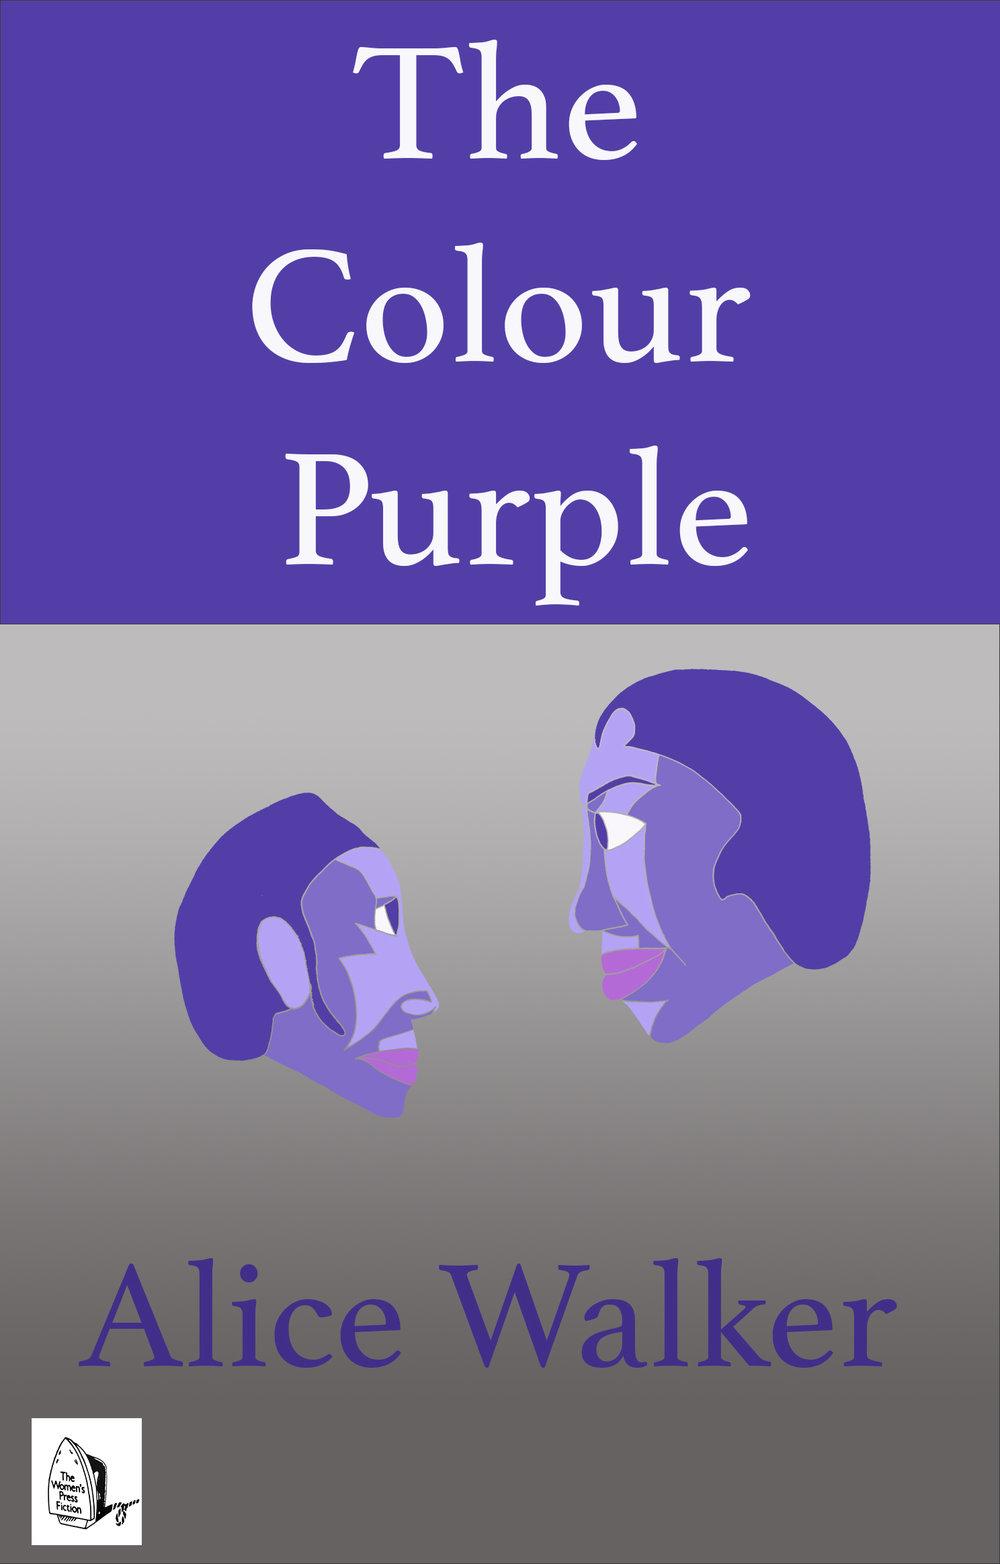 The colour purple cover 7.jpg